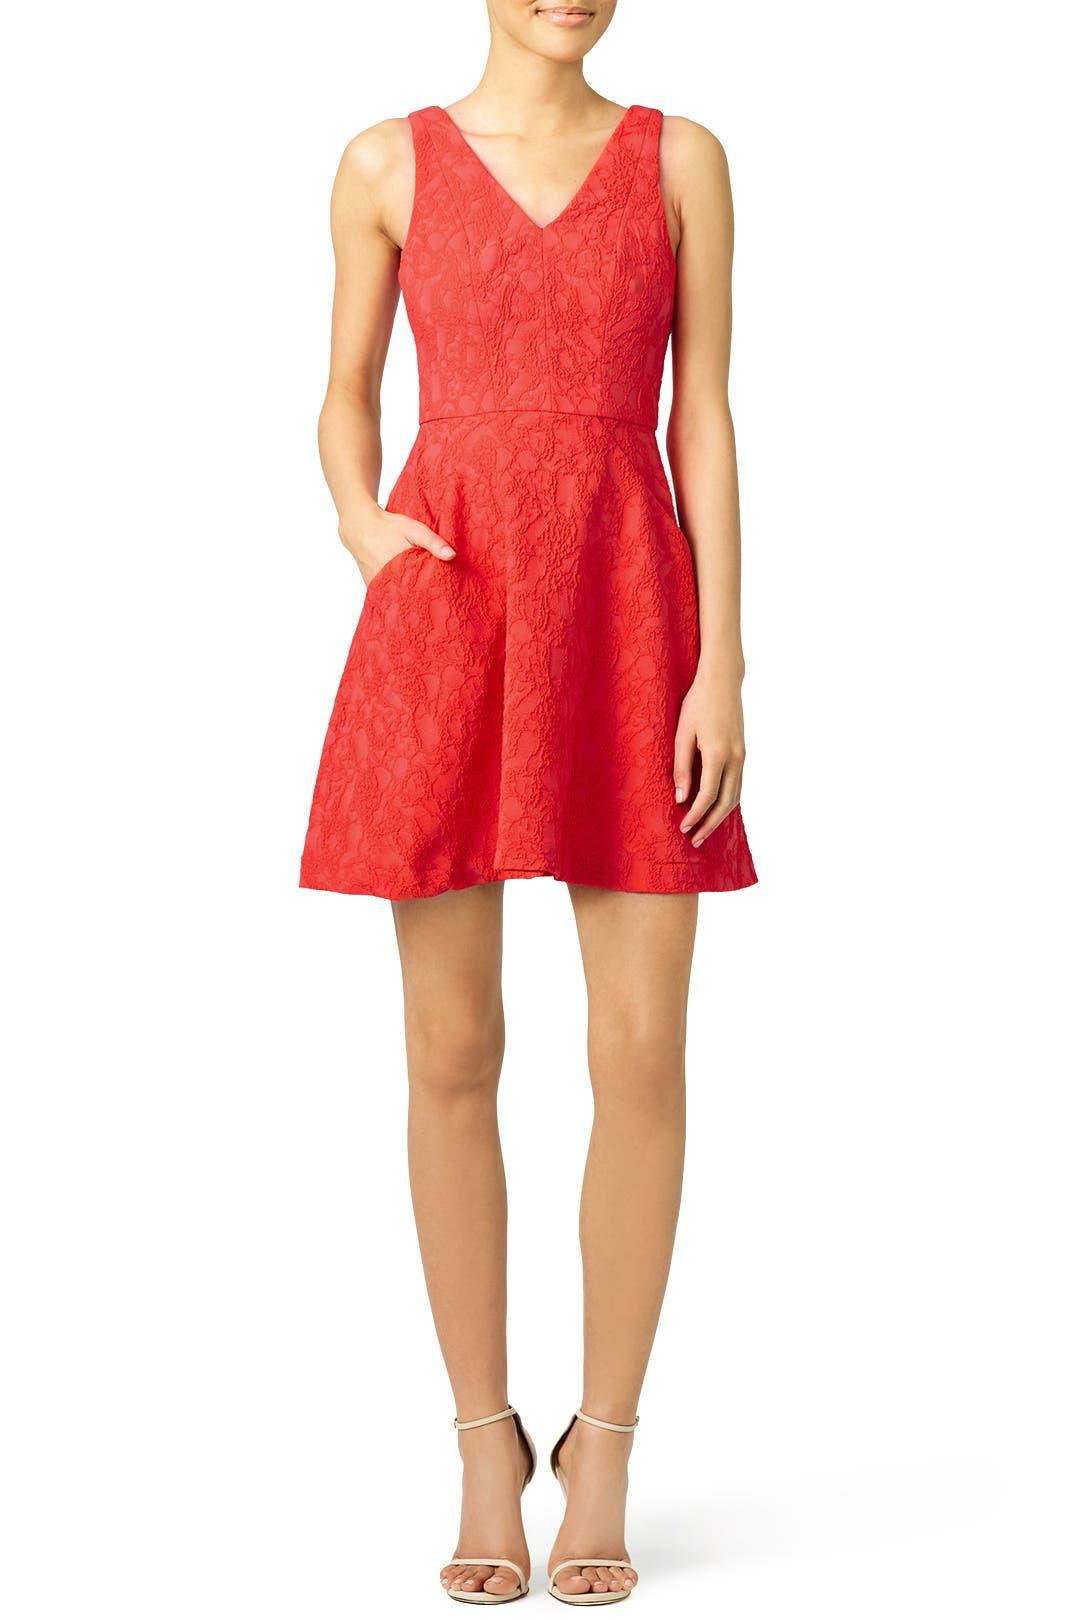 Slate & Willow Red Taliya Dress